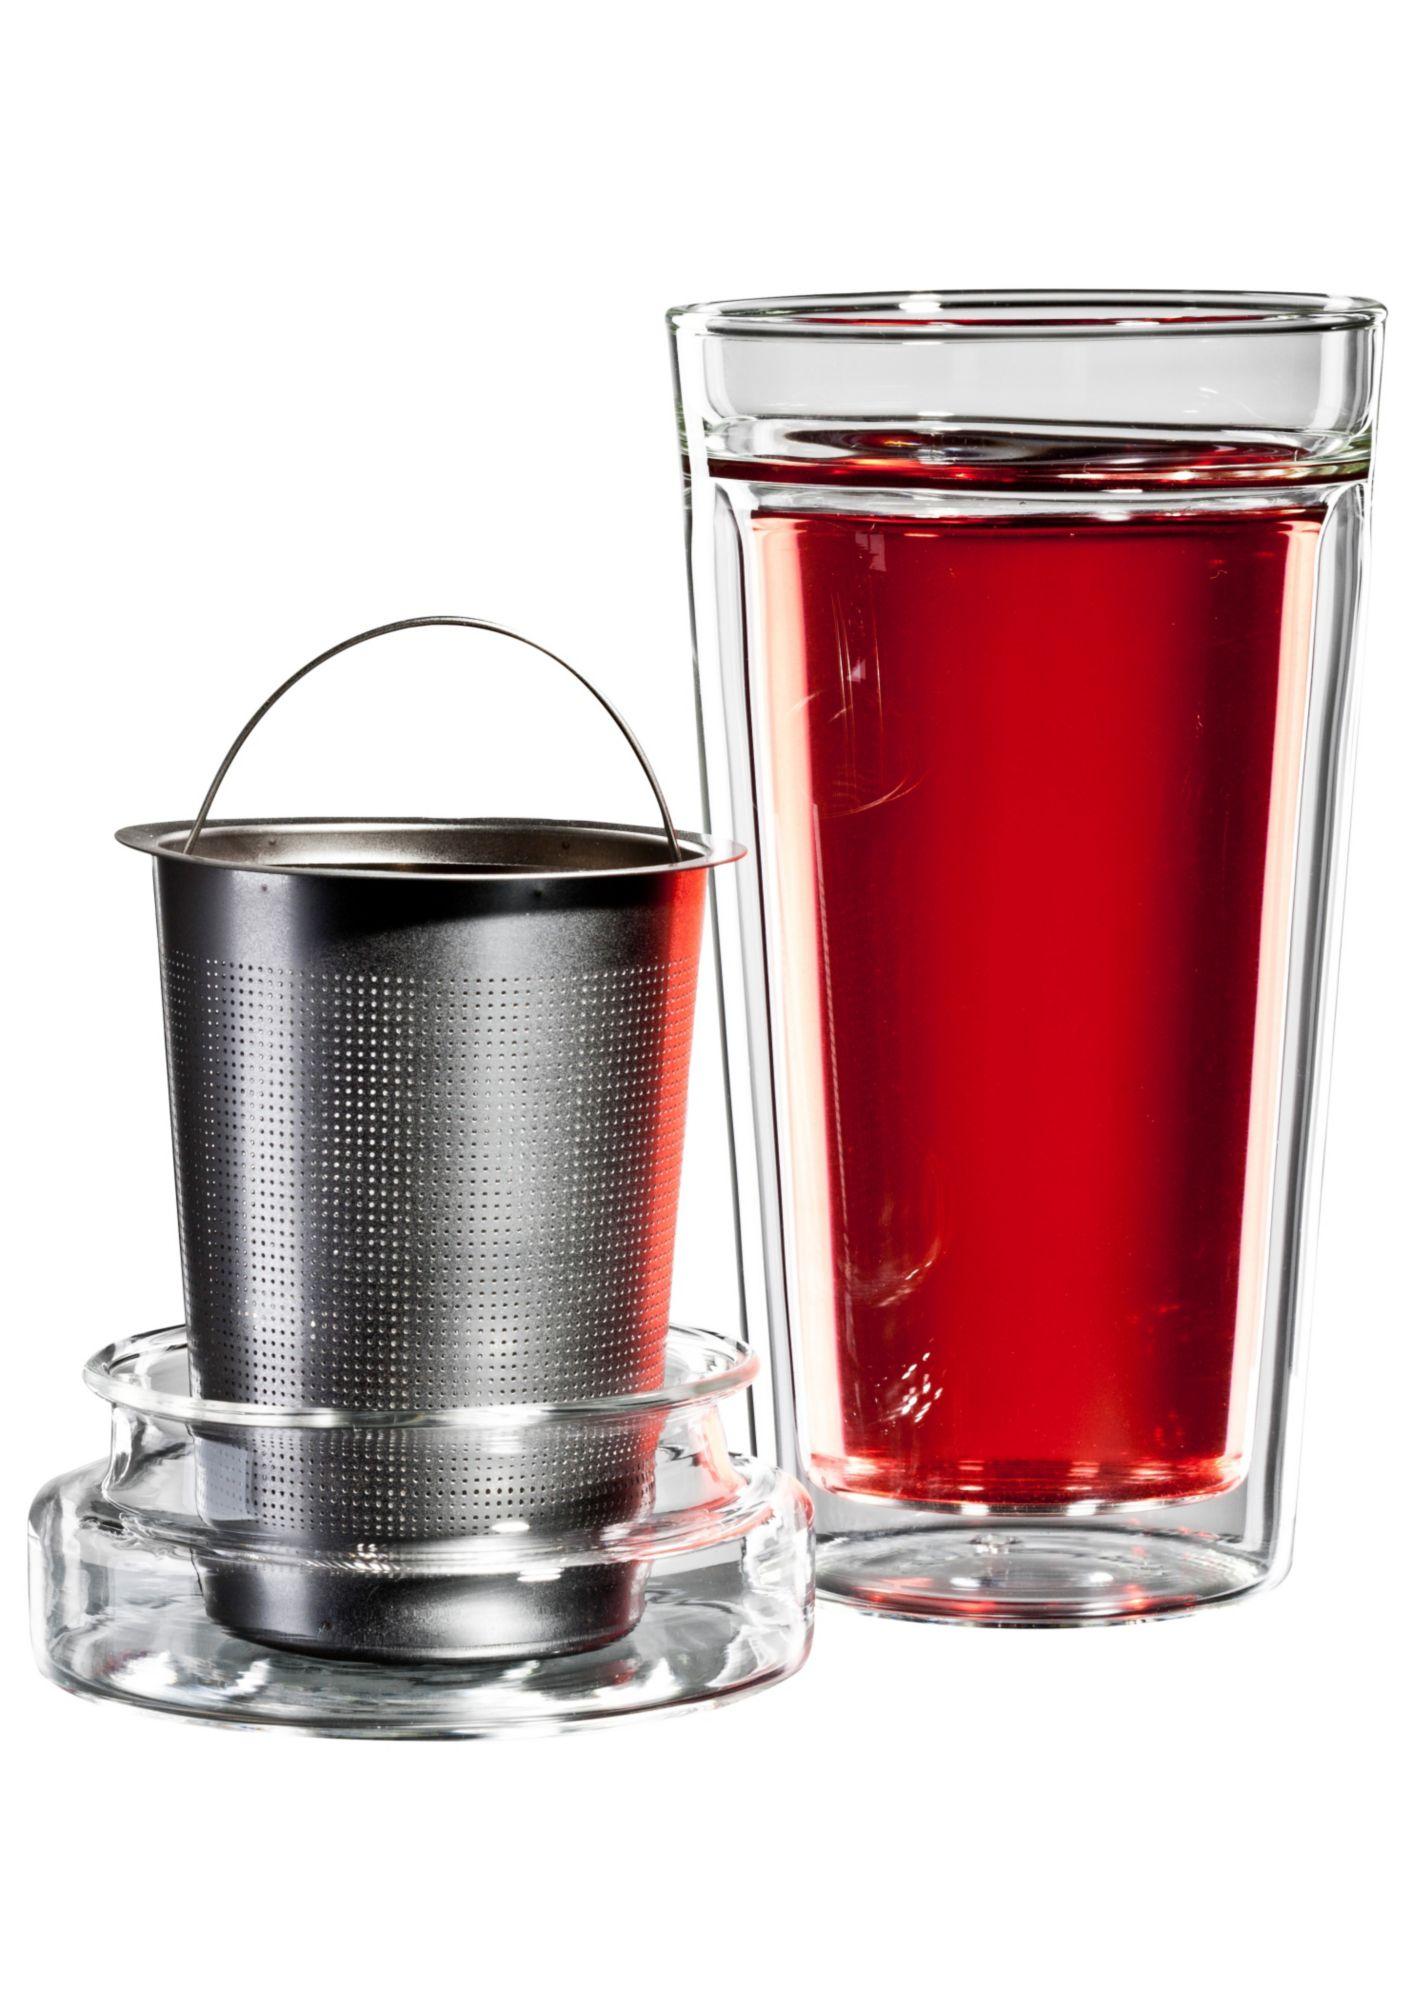 BLOOMIX bloomix Teeset, »Tea Time«